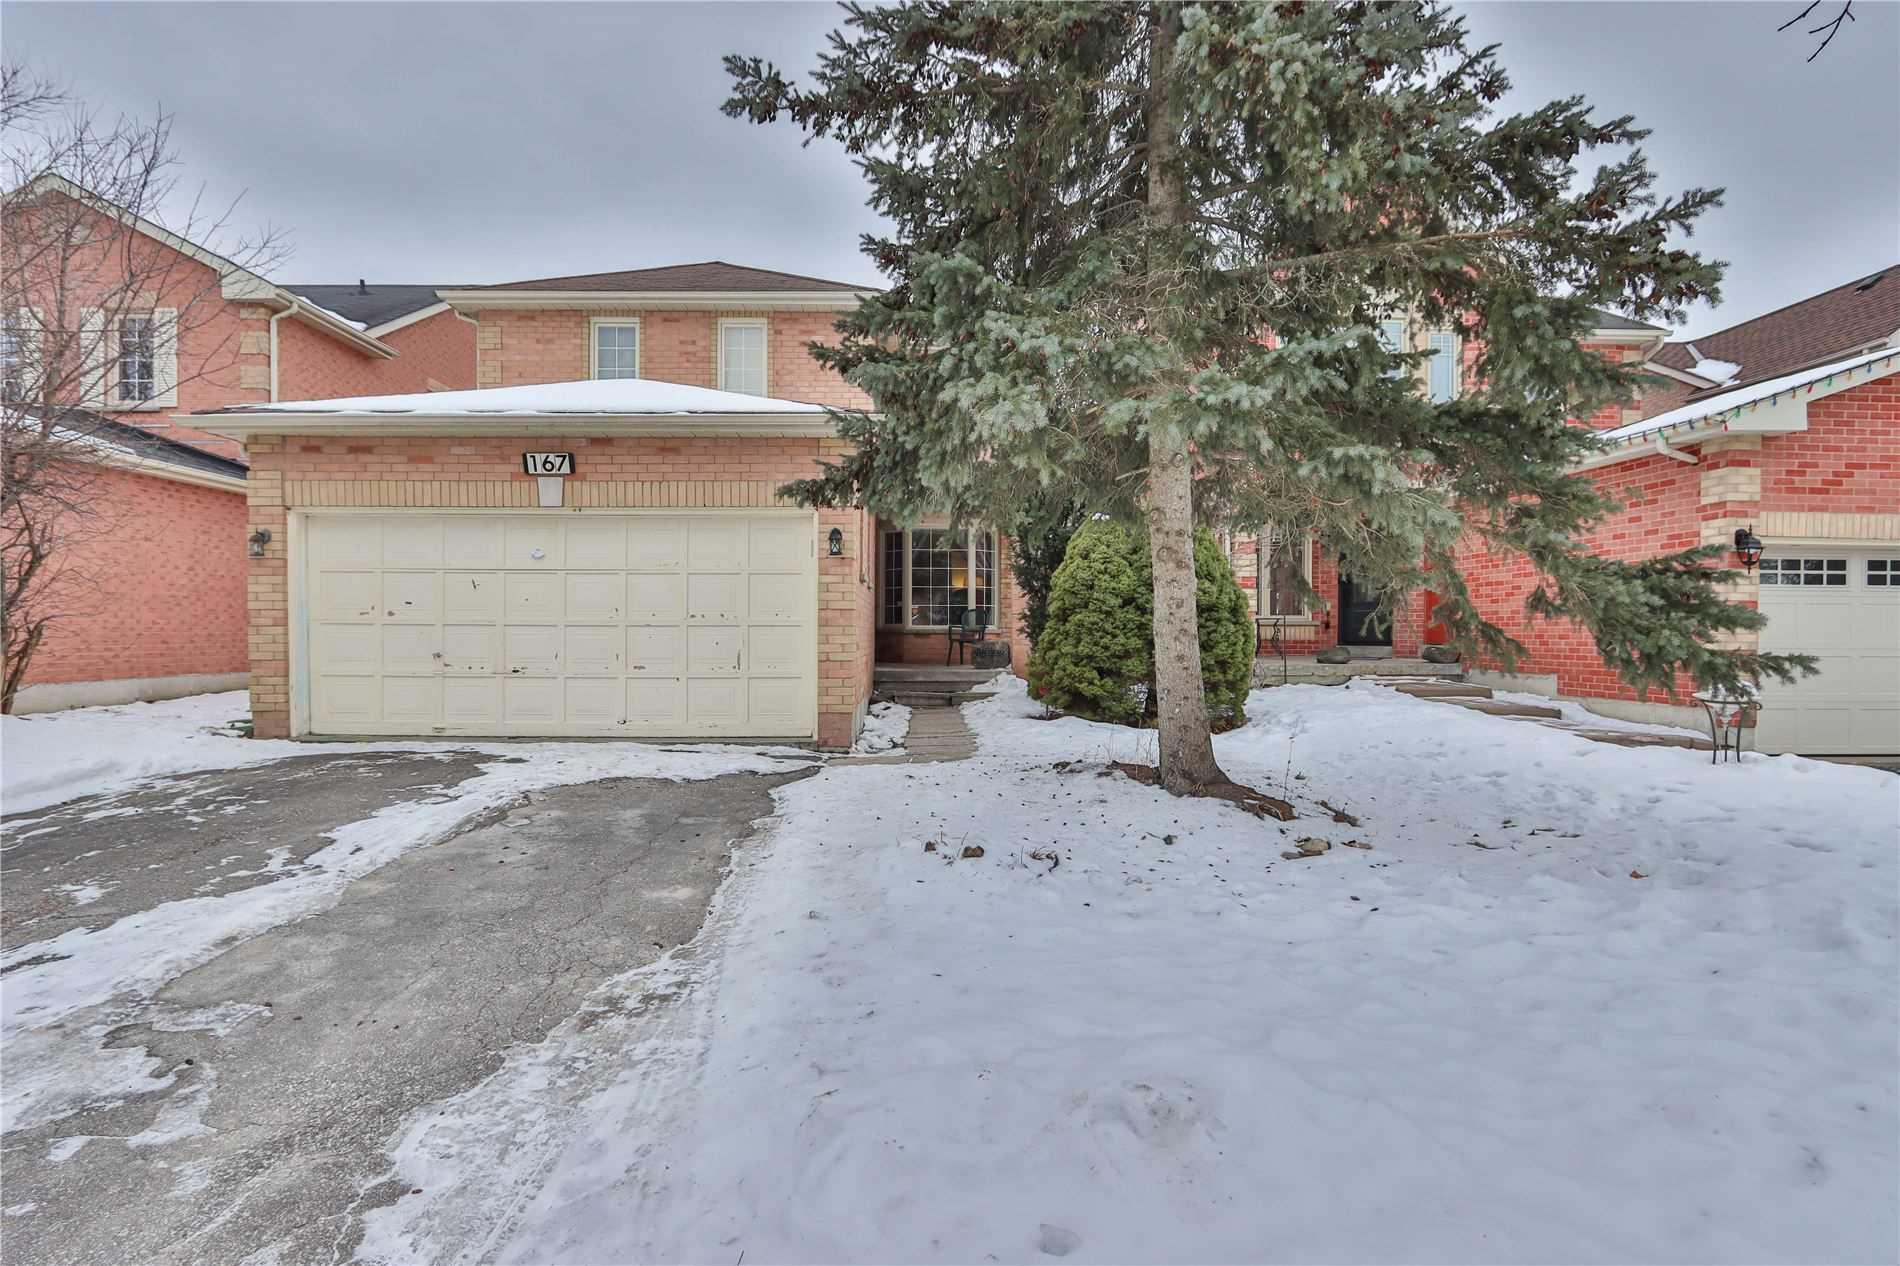 167 Dawlish Ave, Aurora Ontario, Canada